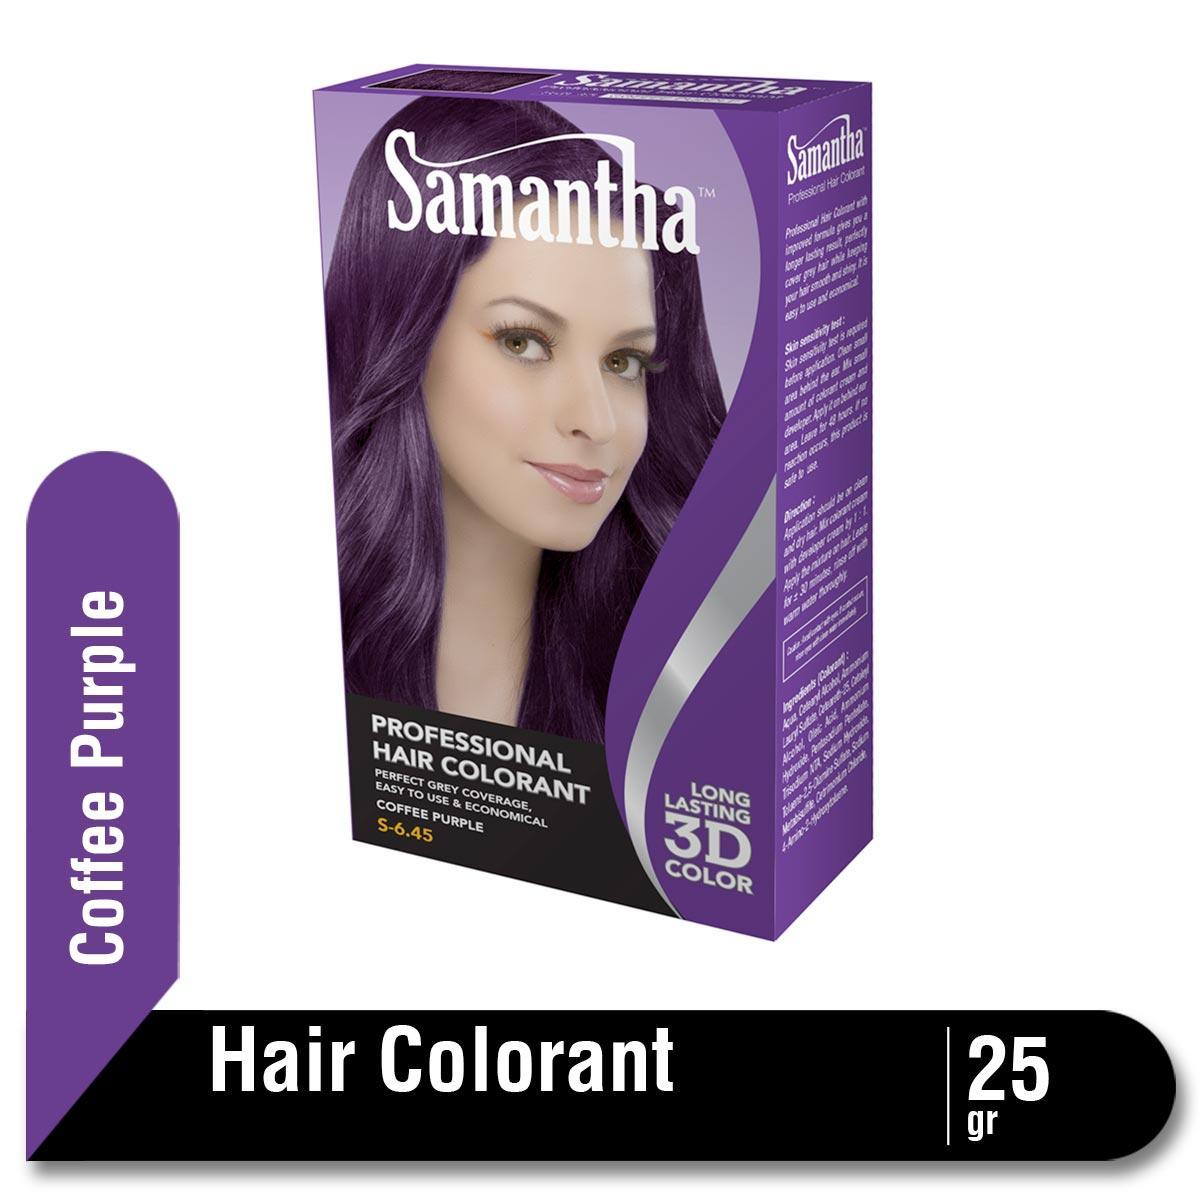 Samantha Professional Hair Colorant Coffe Purple 25gr